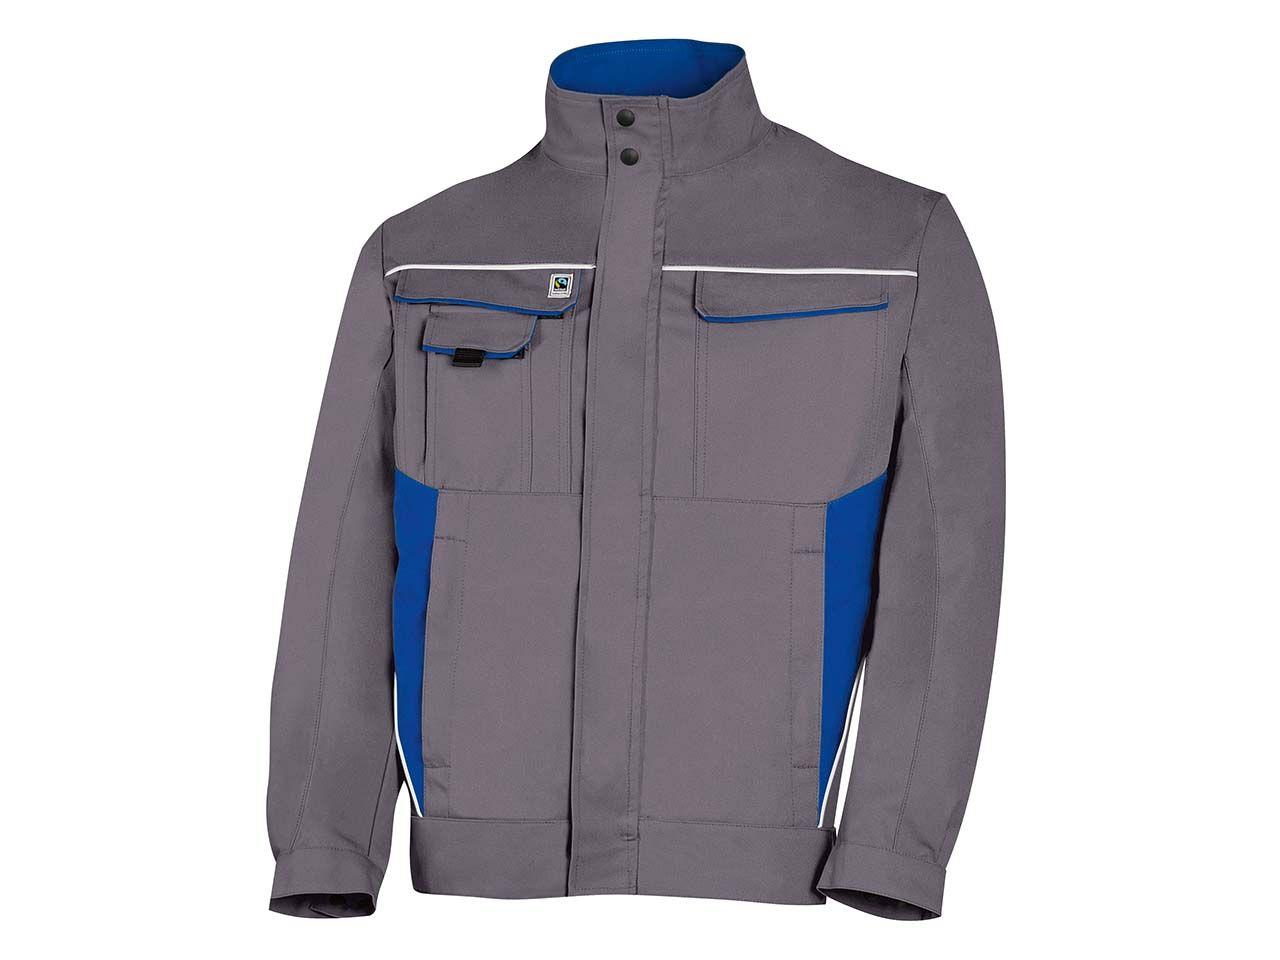 Unisex-Arbeitsjacke grau/blau, Gr. 64